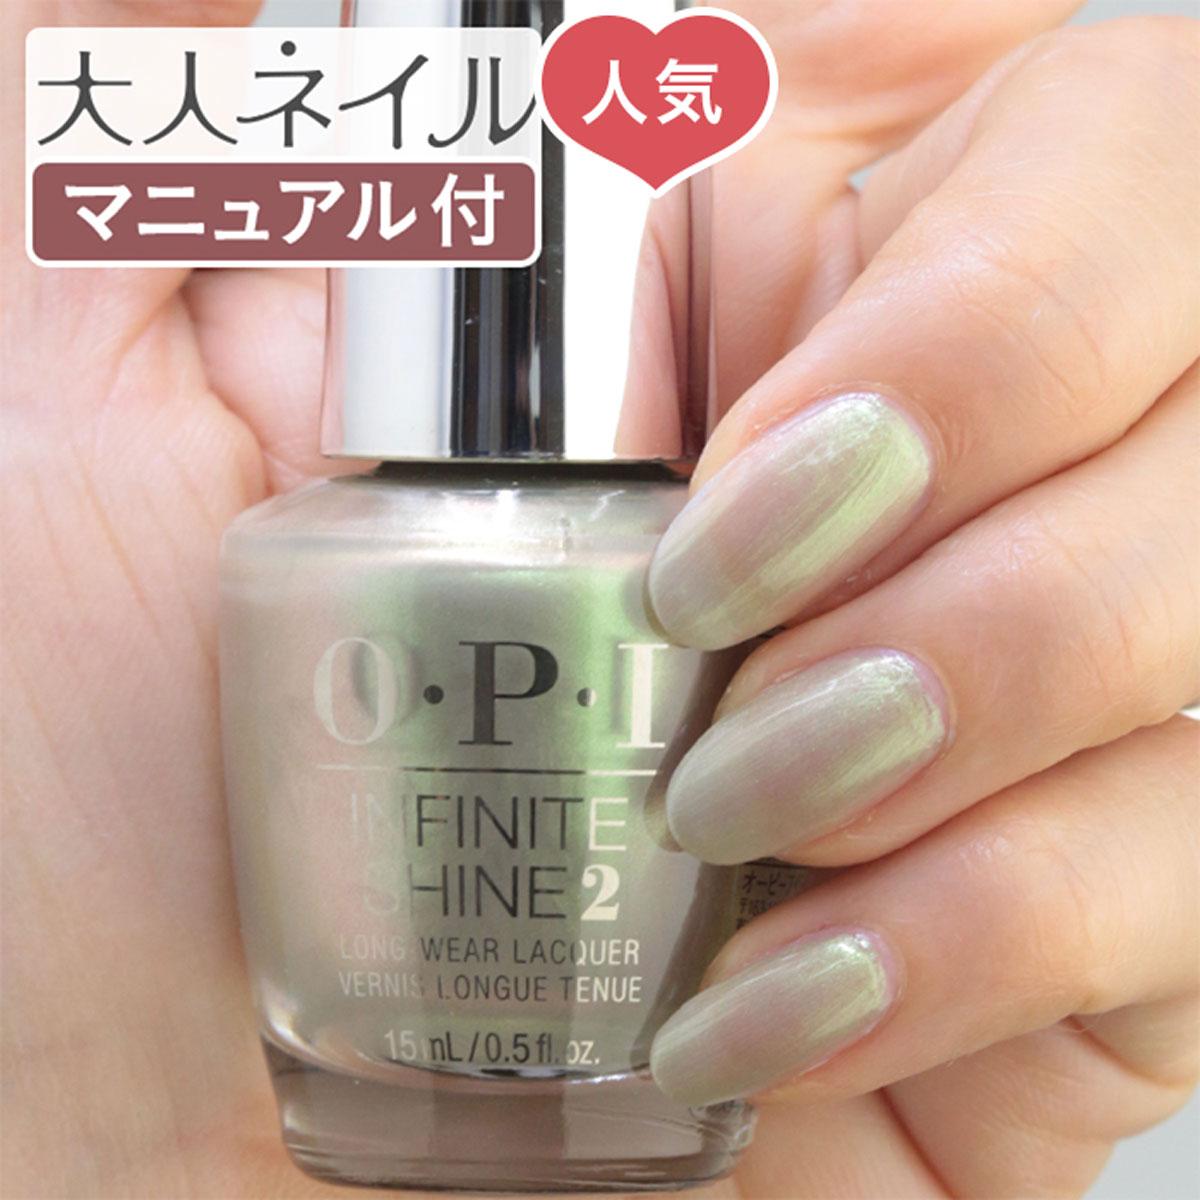 OPI INFINITE SHINE インフィニット シャイン IS-LE99 OliveforPearls(オリーブ フォー パールズ!) 15ml グリーン パール 偏光 夏ネイル 夏カラー